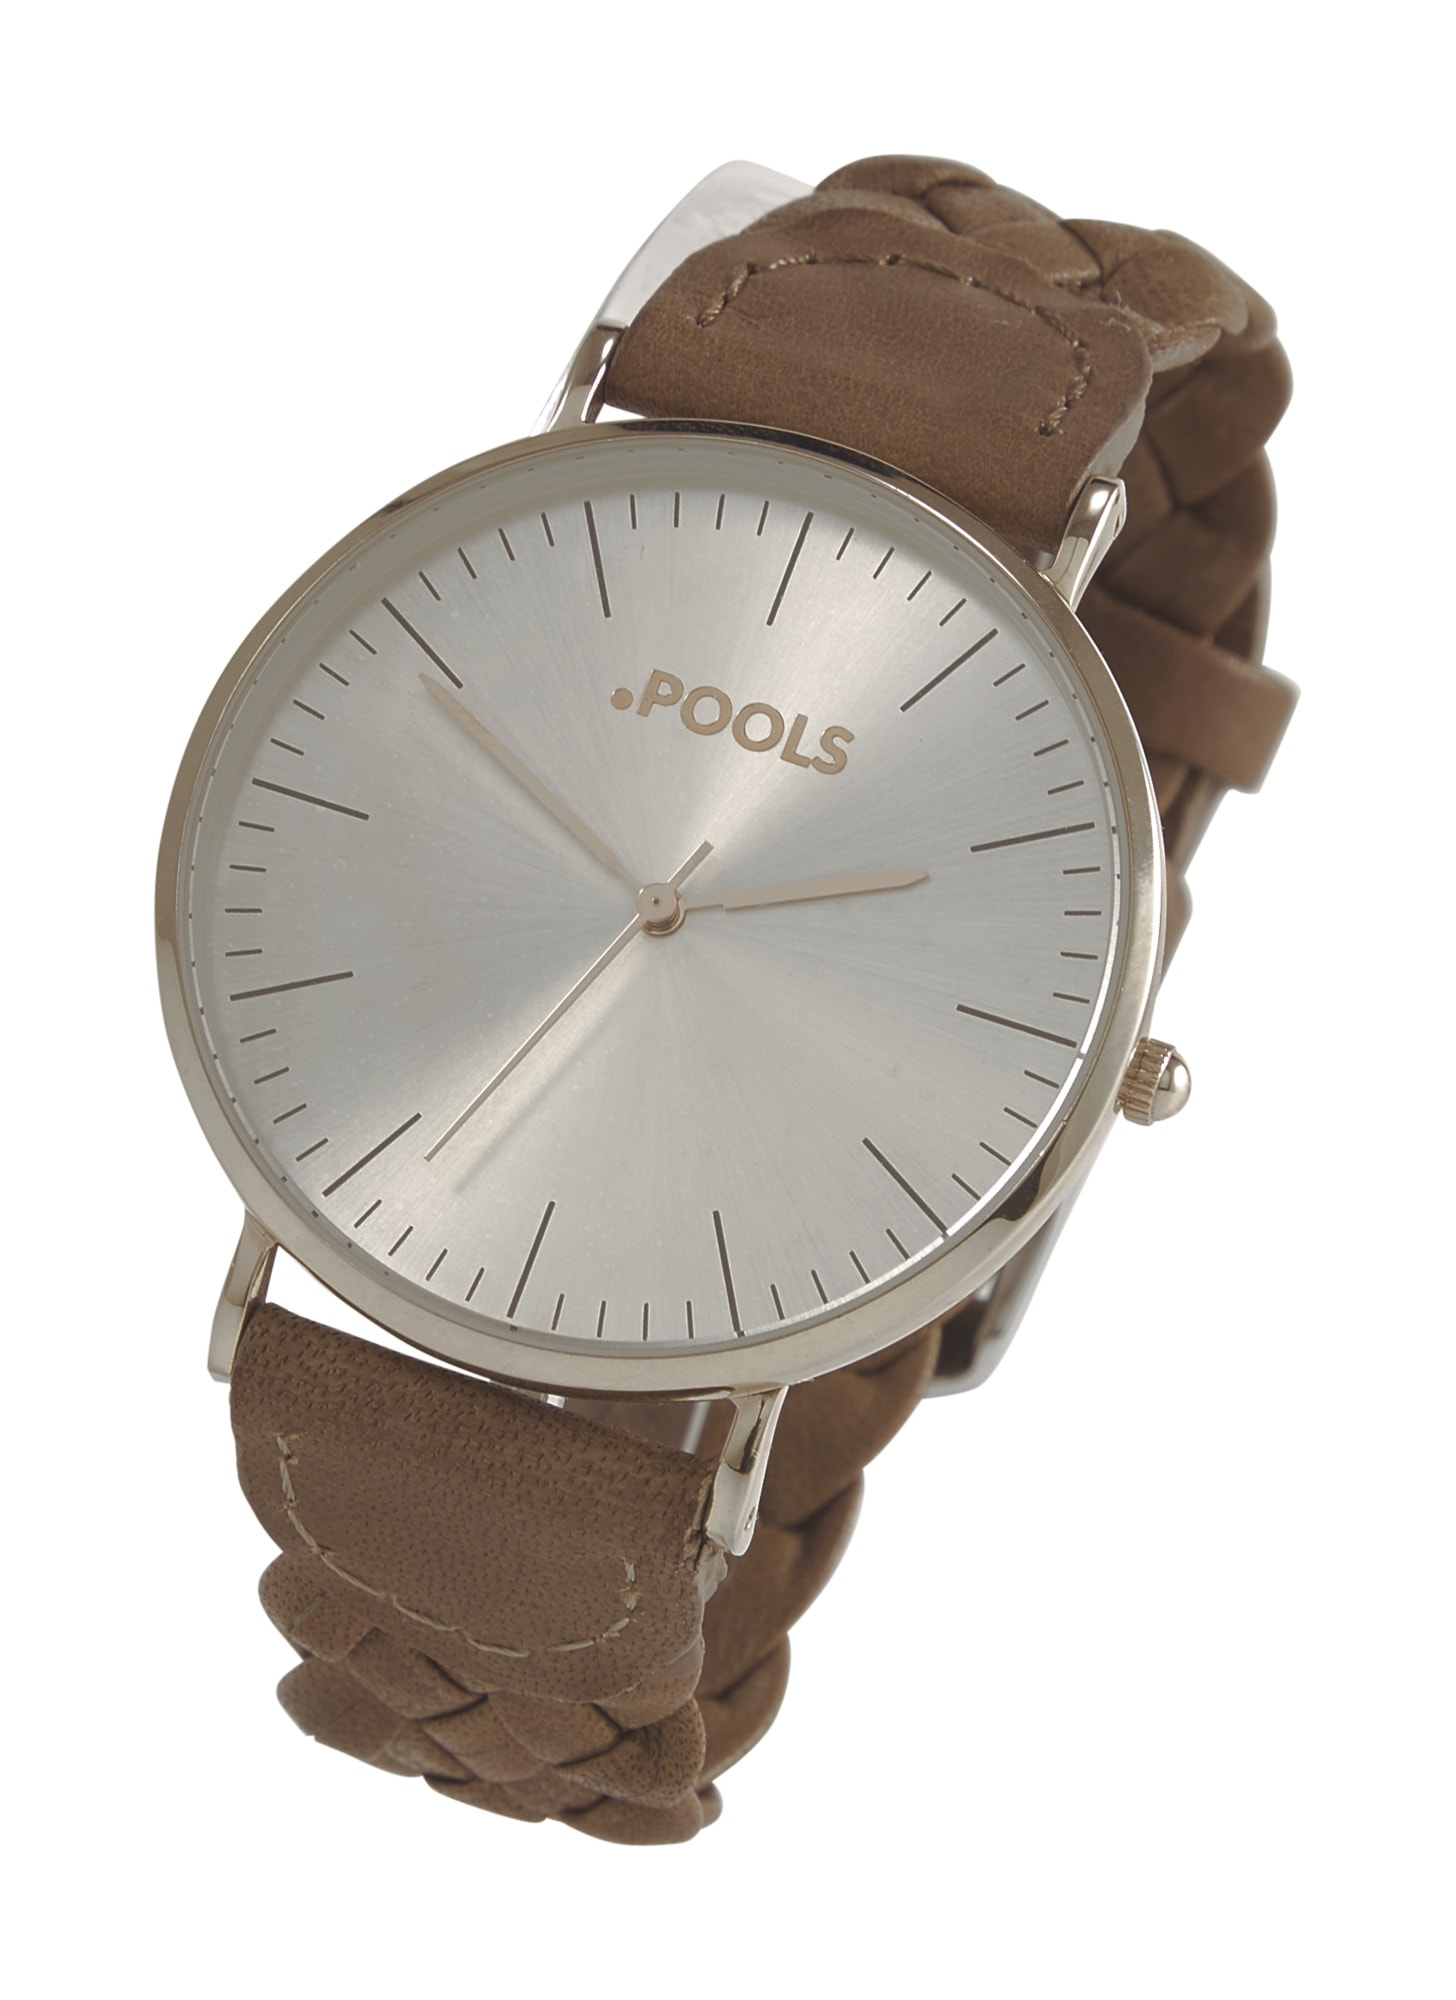 pools - Armbanduhr mir geflochtenem Band